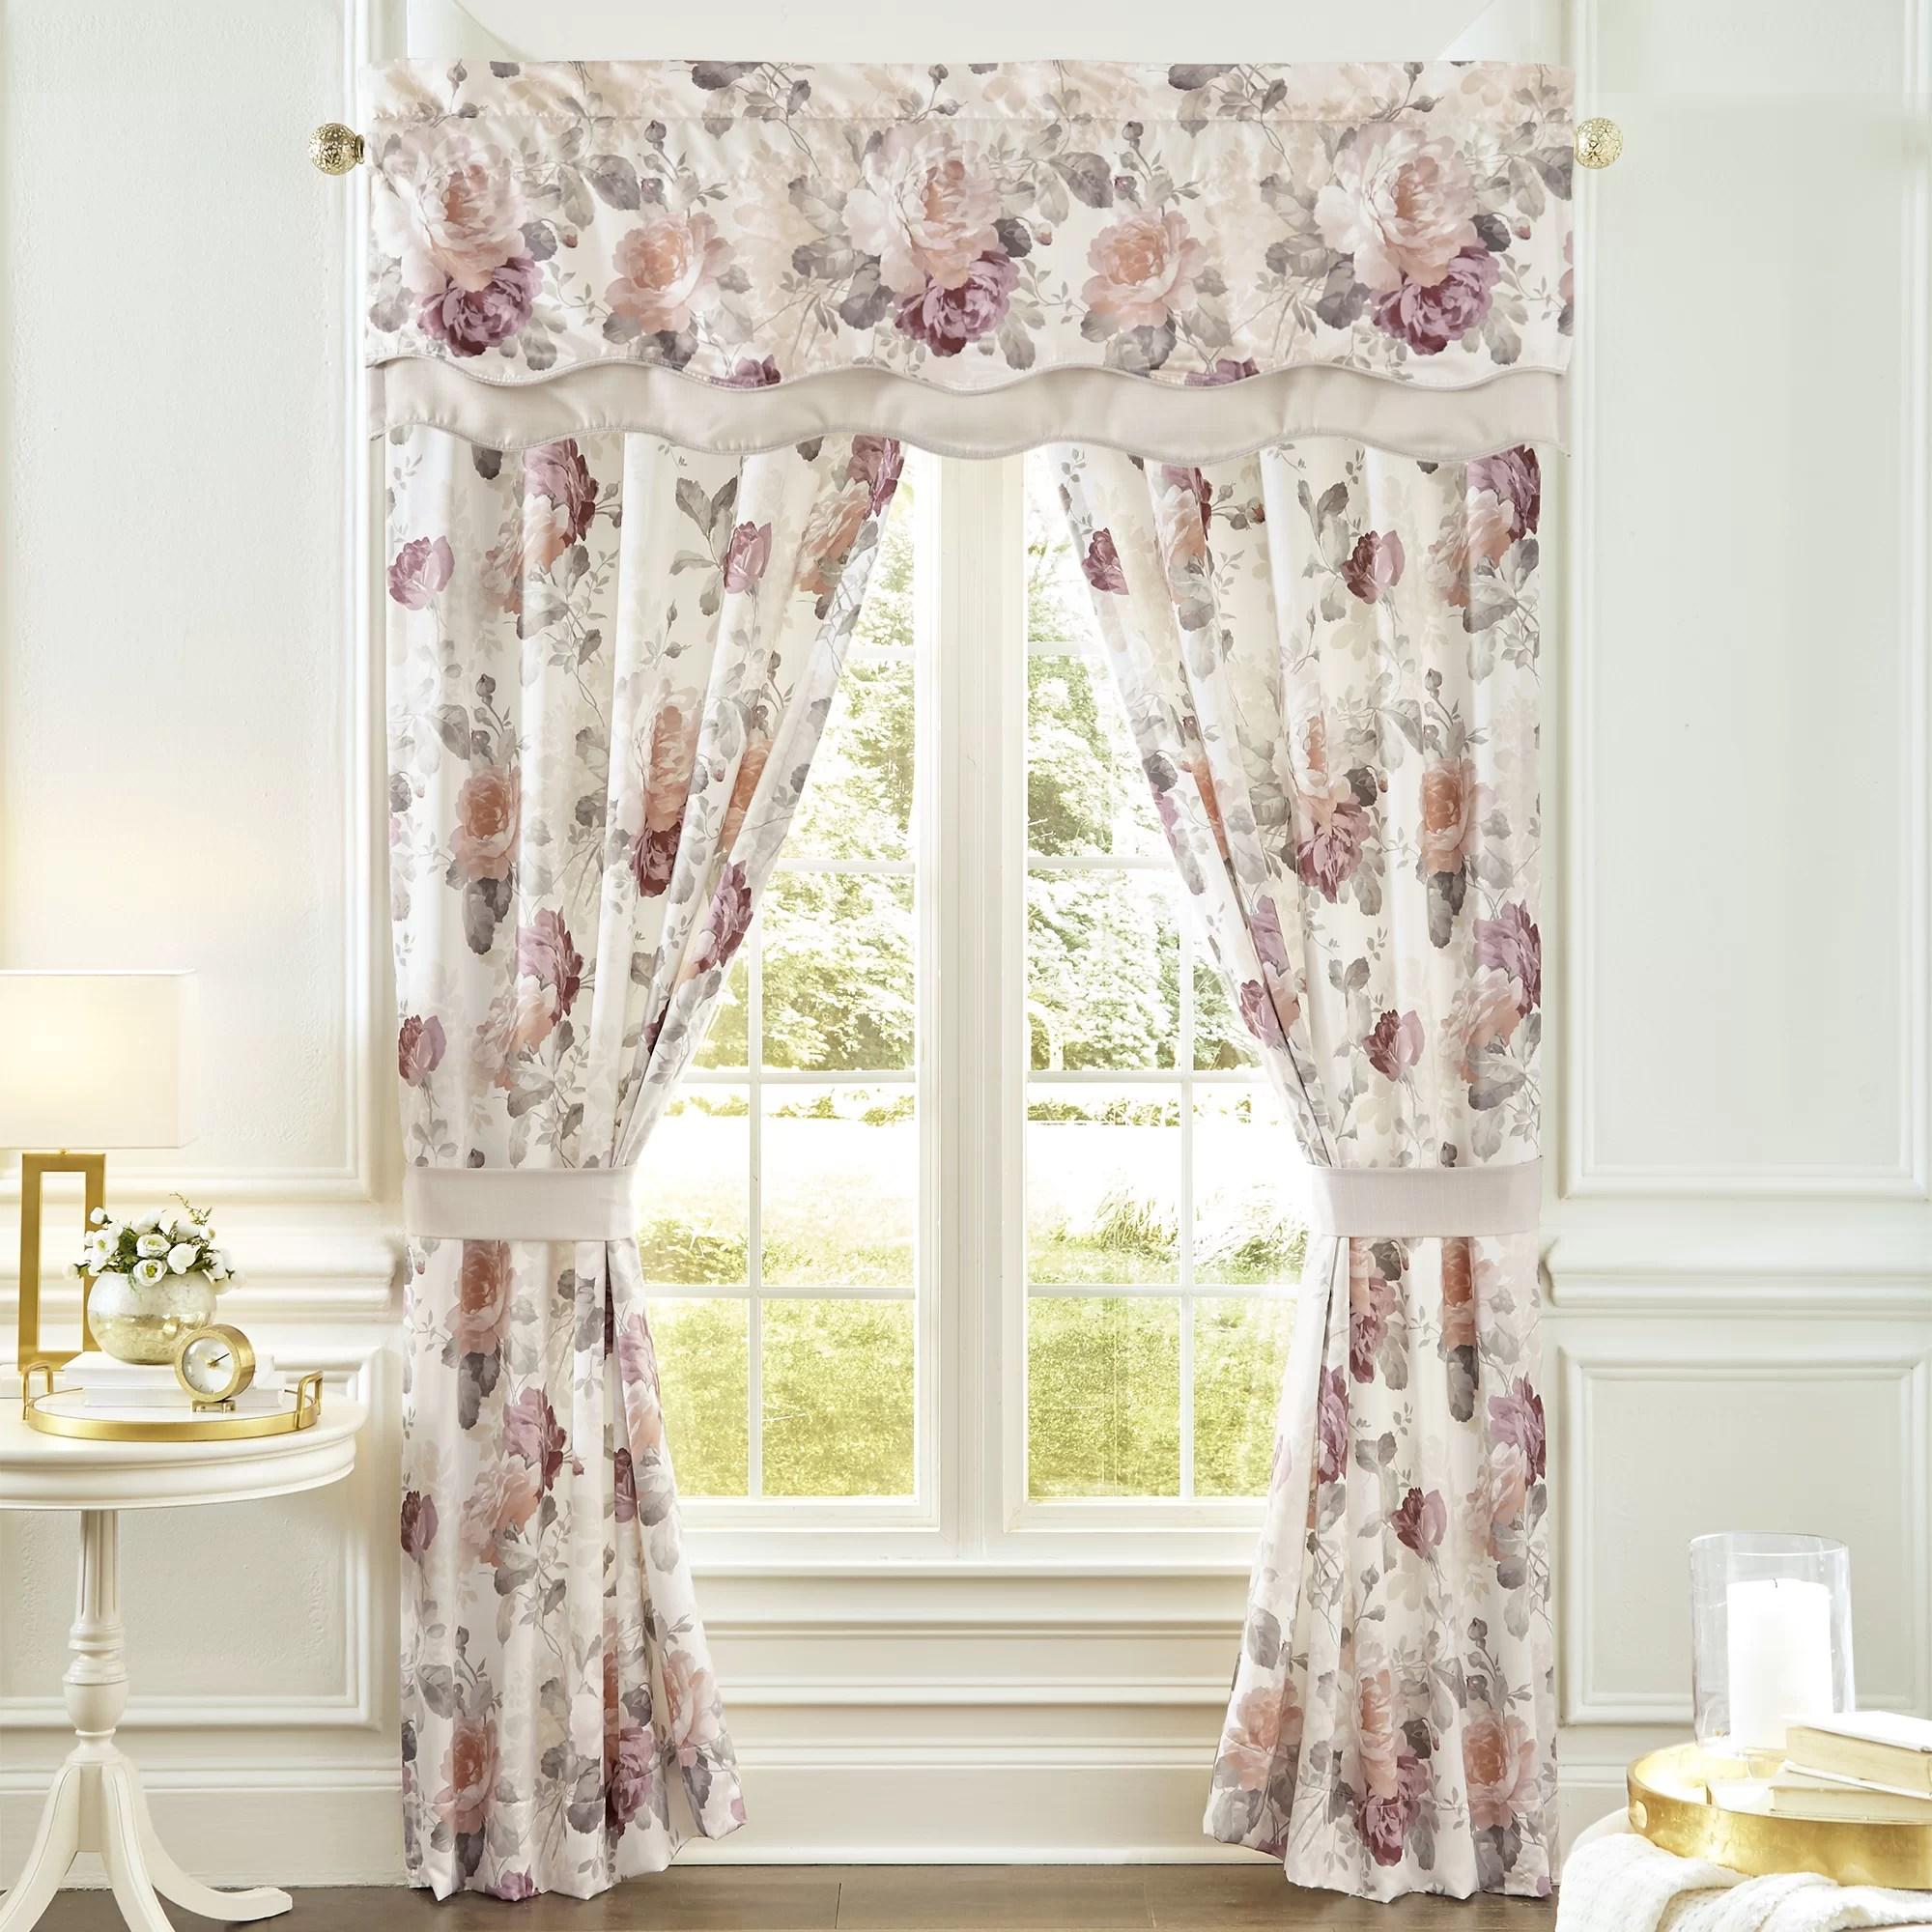 bela pole top drapery floral semi sheer curtains panels